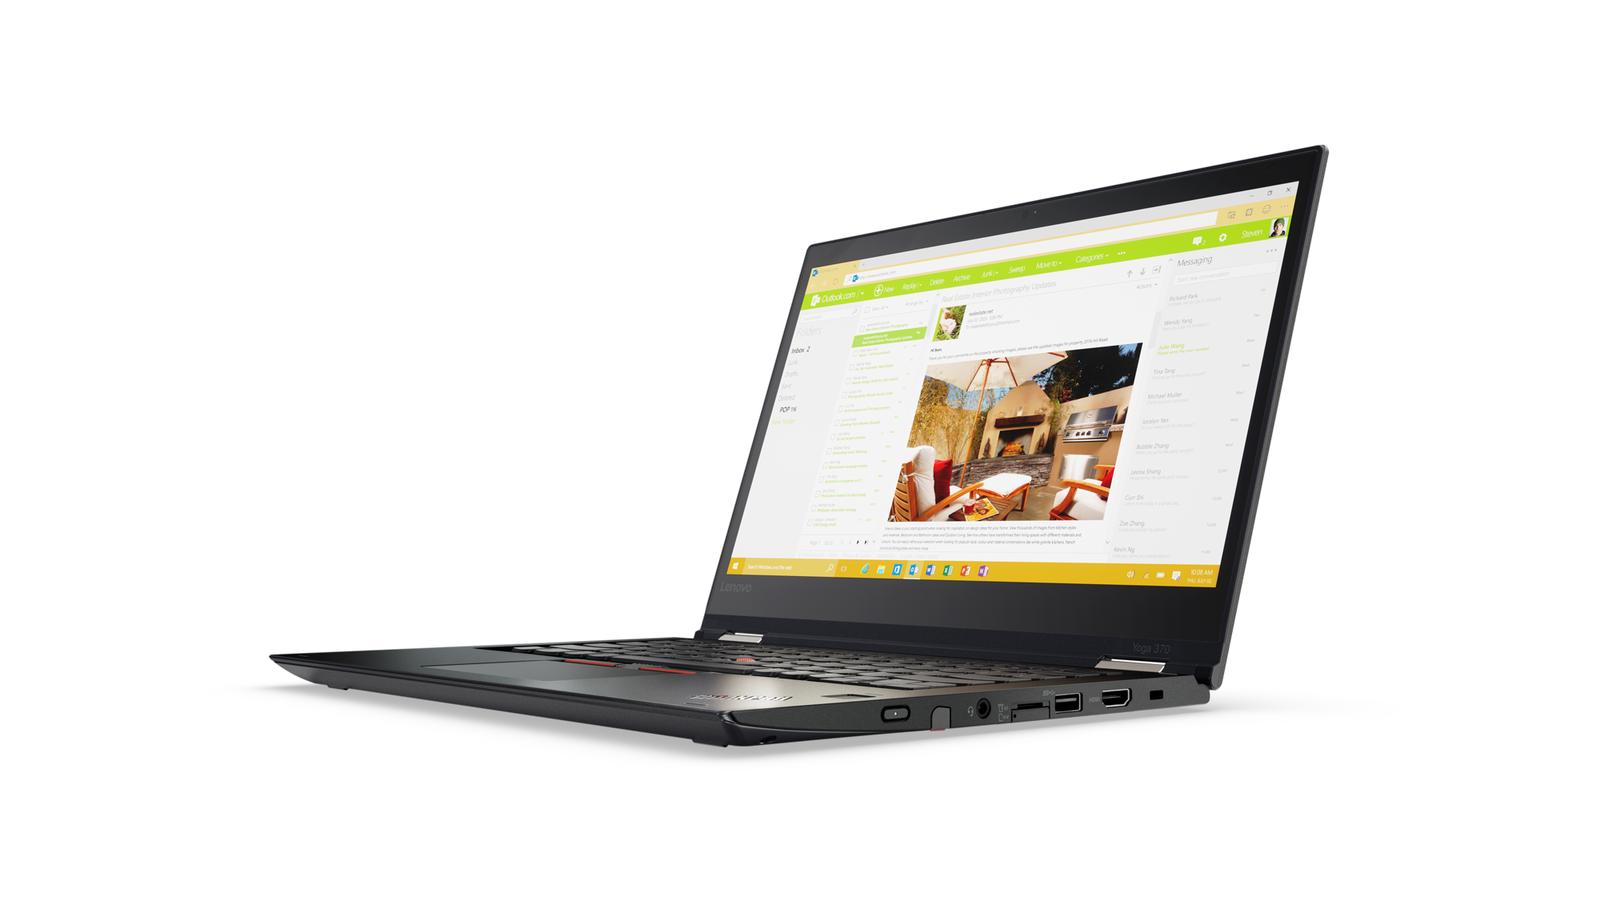 "Lenovo ThinkPad YOGA 370 i5-7200U/8GB/512GB SSD/HD Graphics 620/13,3""FHD IPS multitouch/4G/Win10PRO/Black"